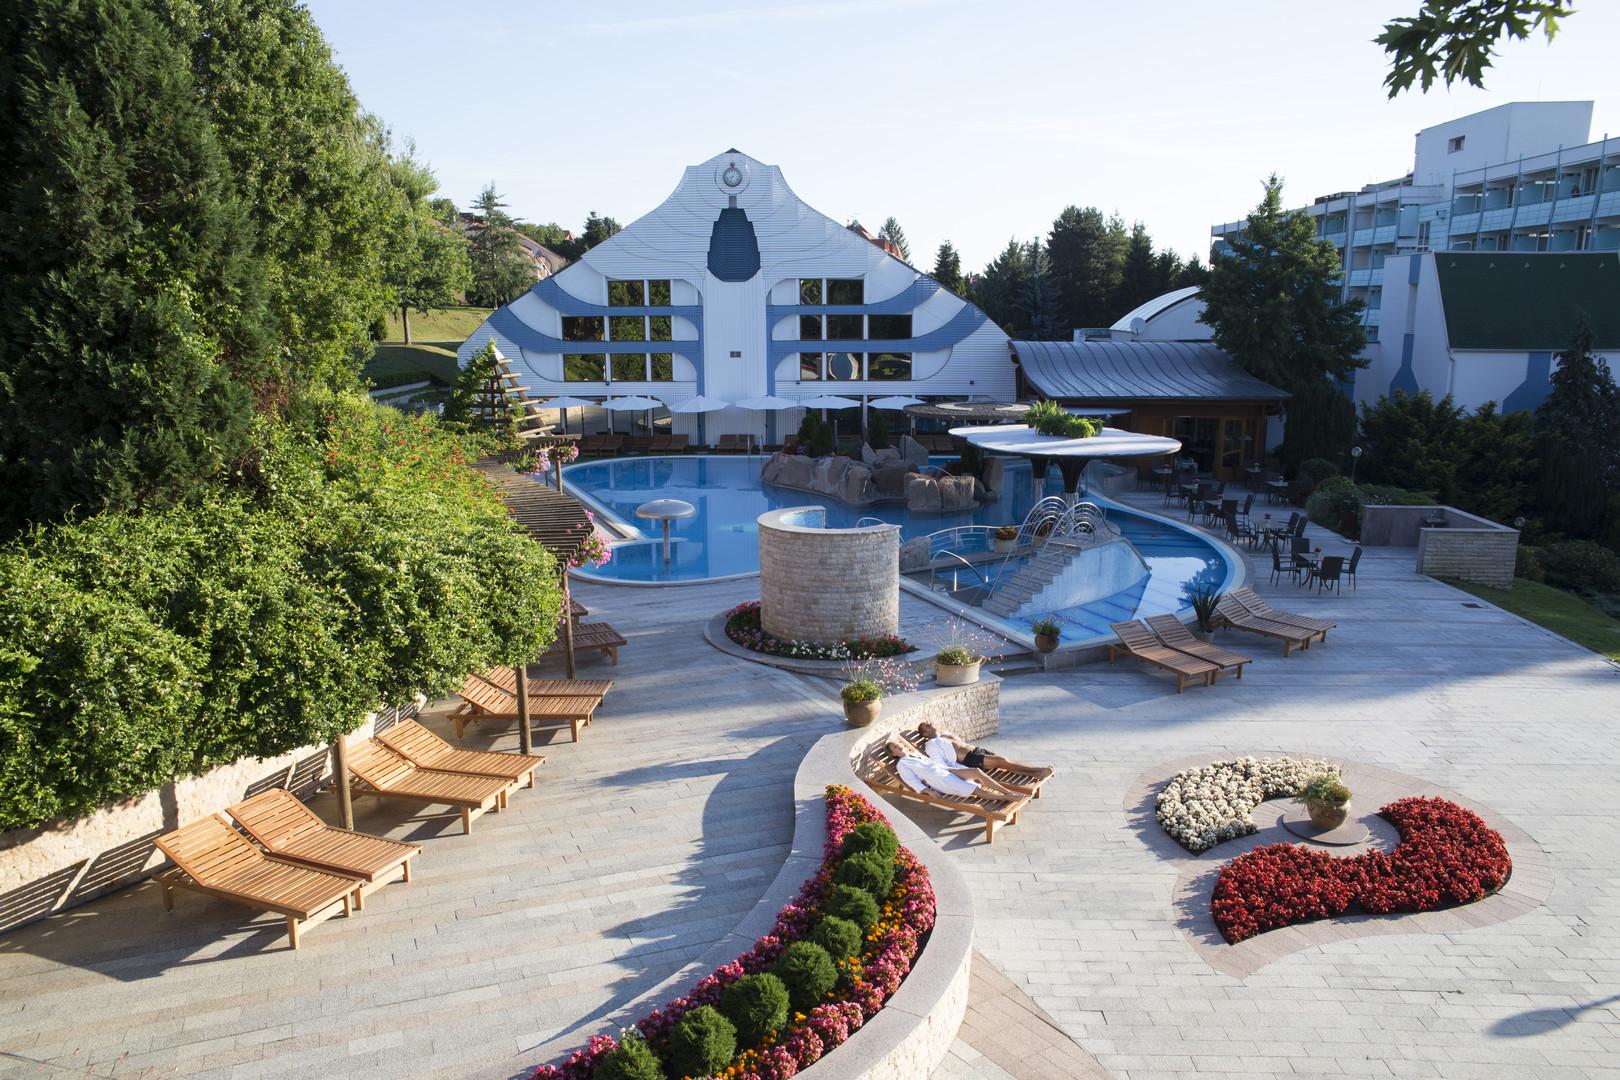 NaturMed Hotel Carbona #3